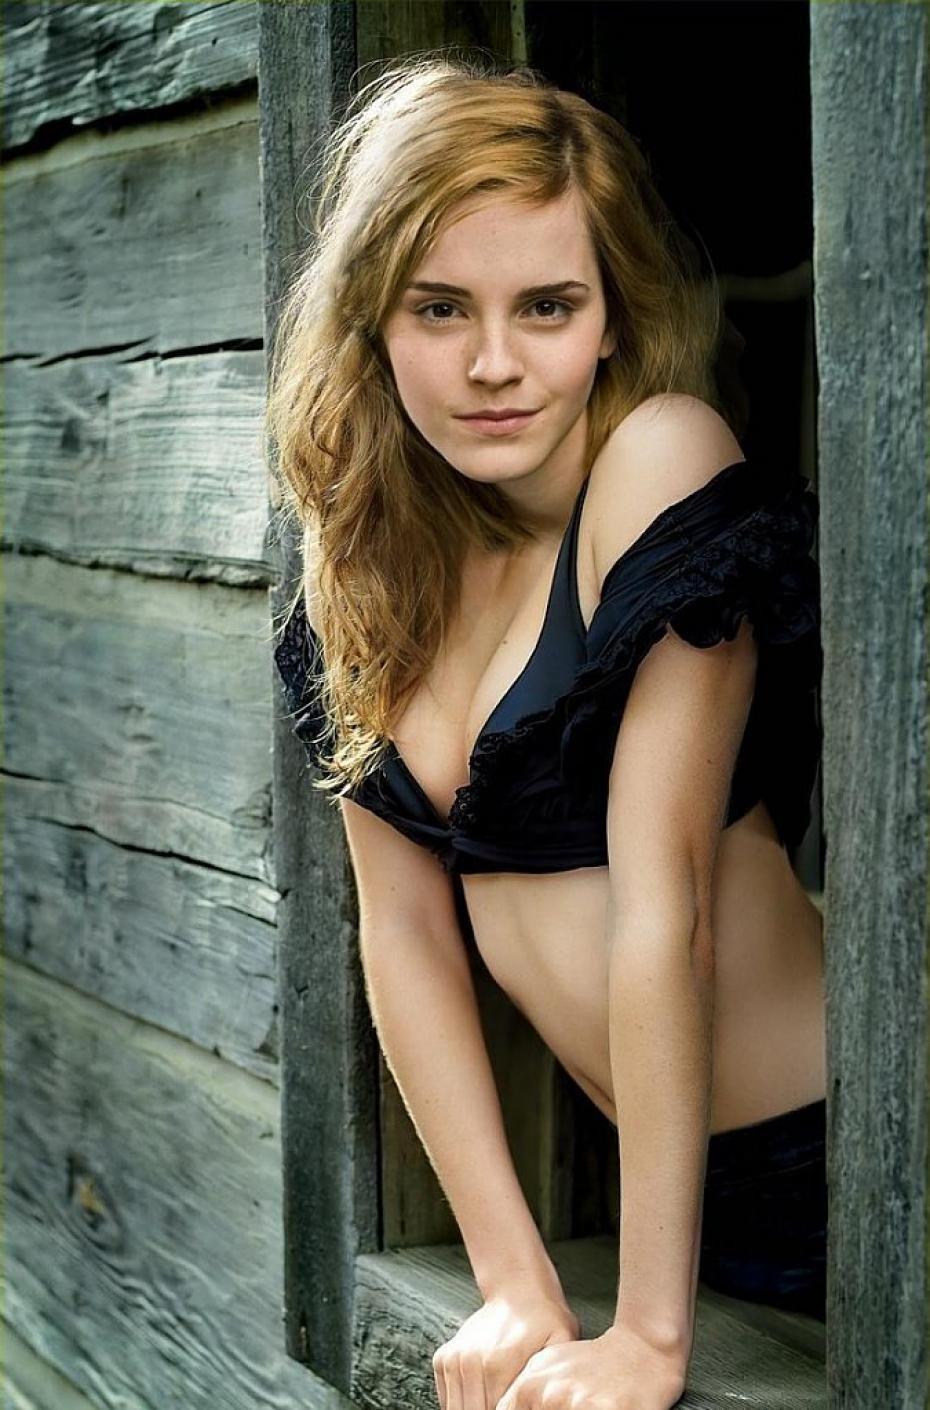 Emma watson sexy hot photos